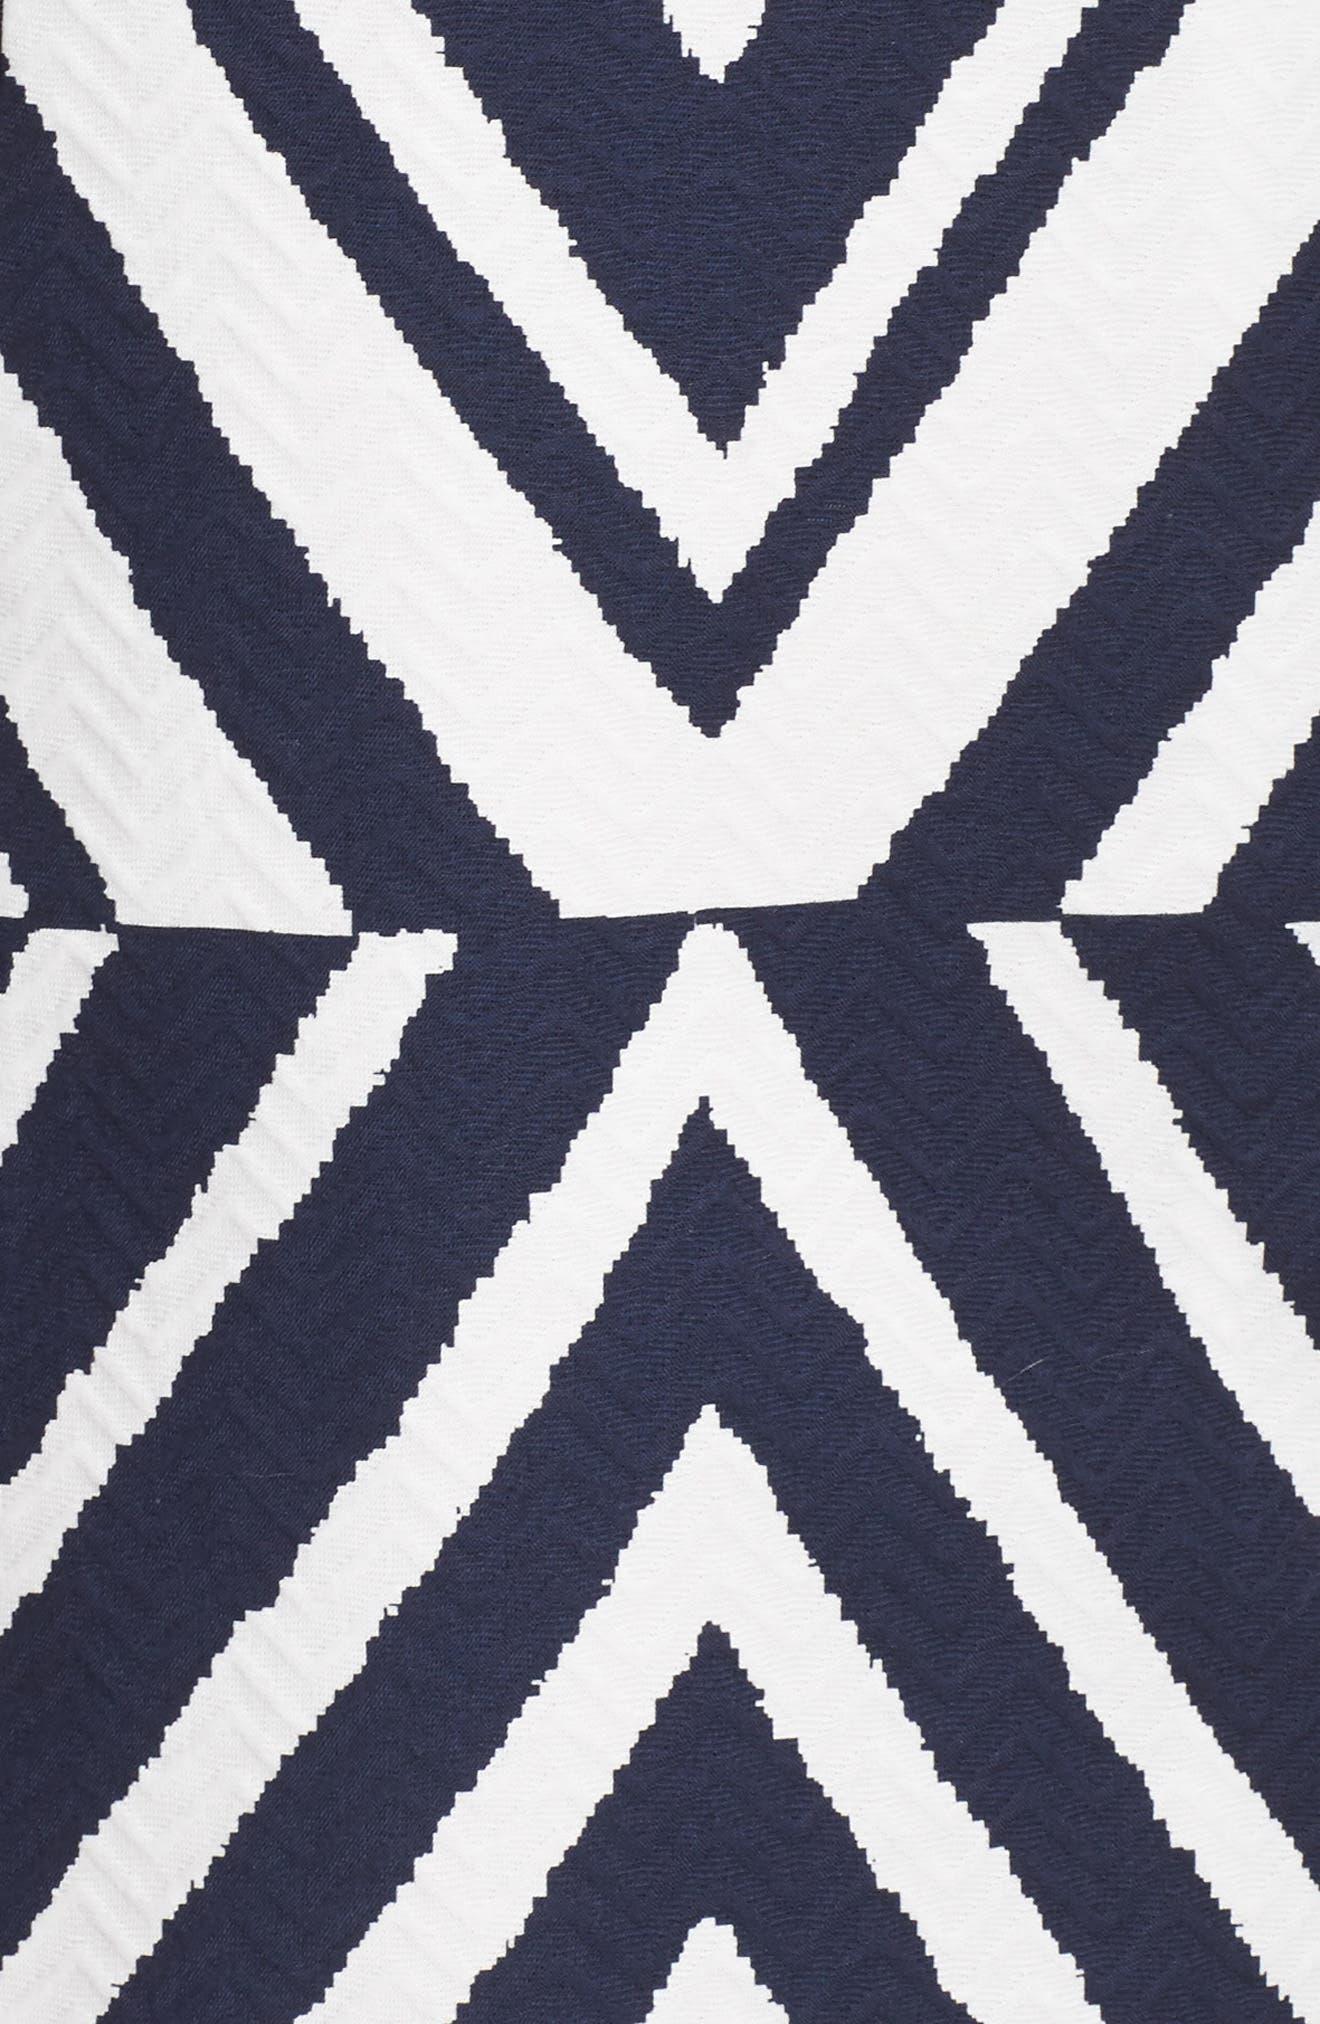 Texture Sheath Dress,                             Alternate thumbnail 6, color,